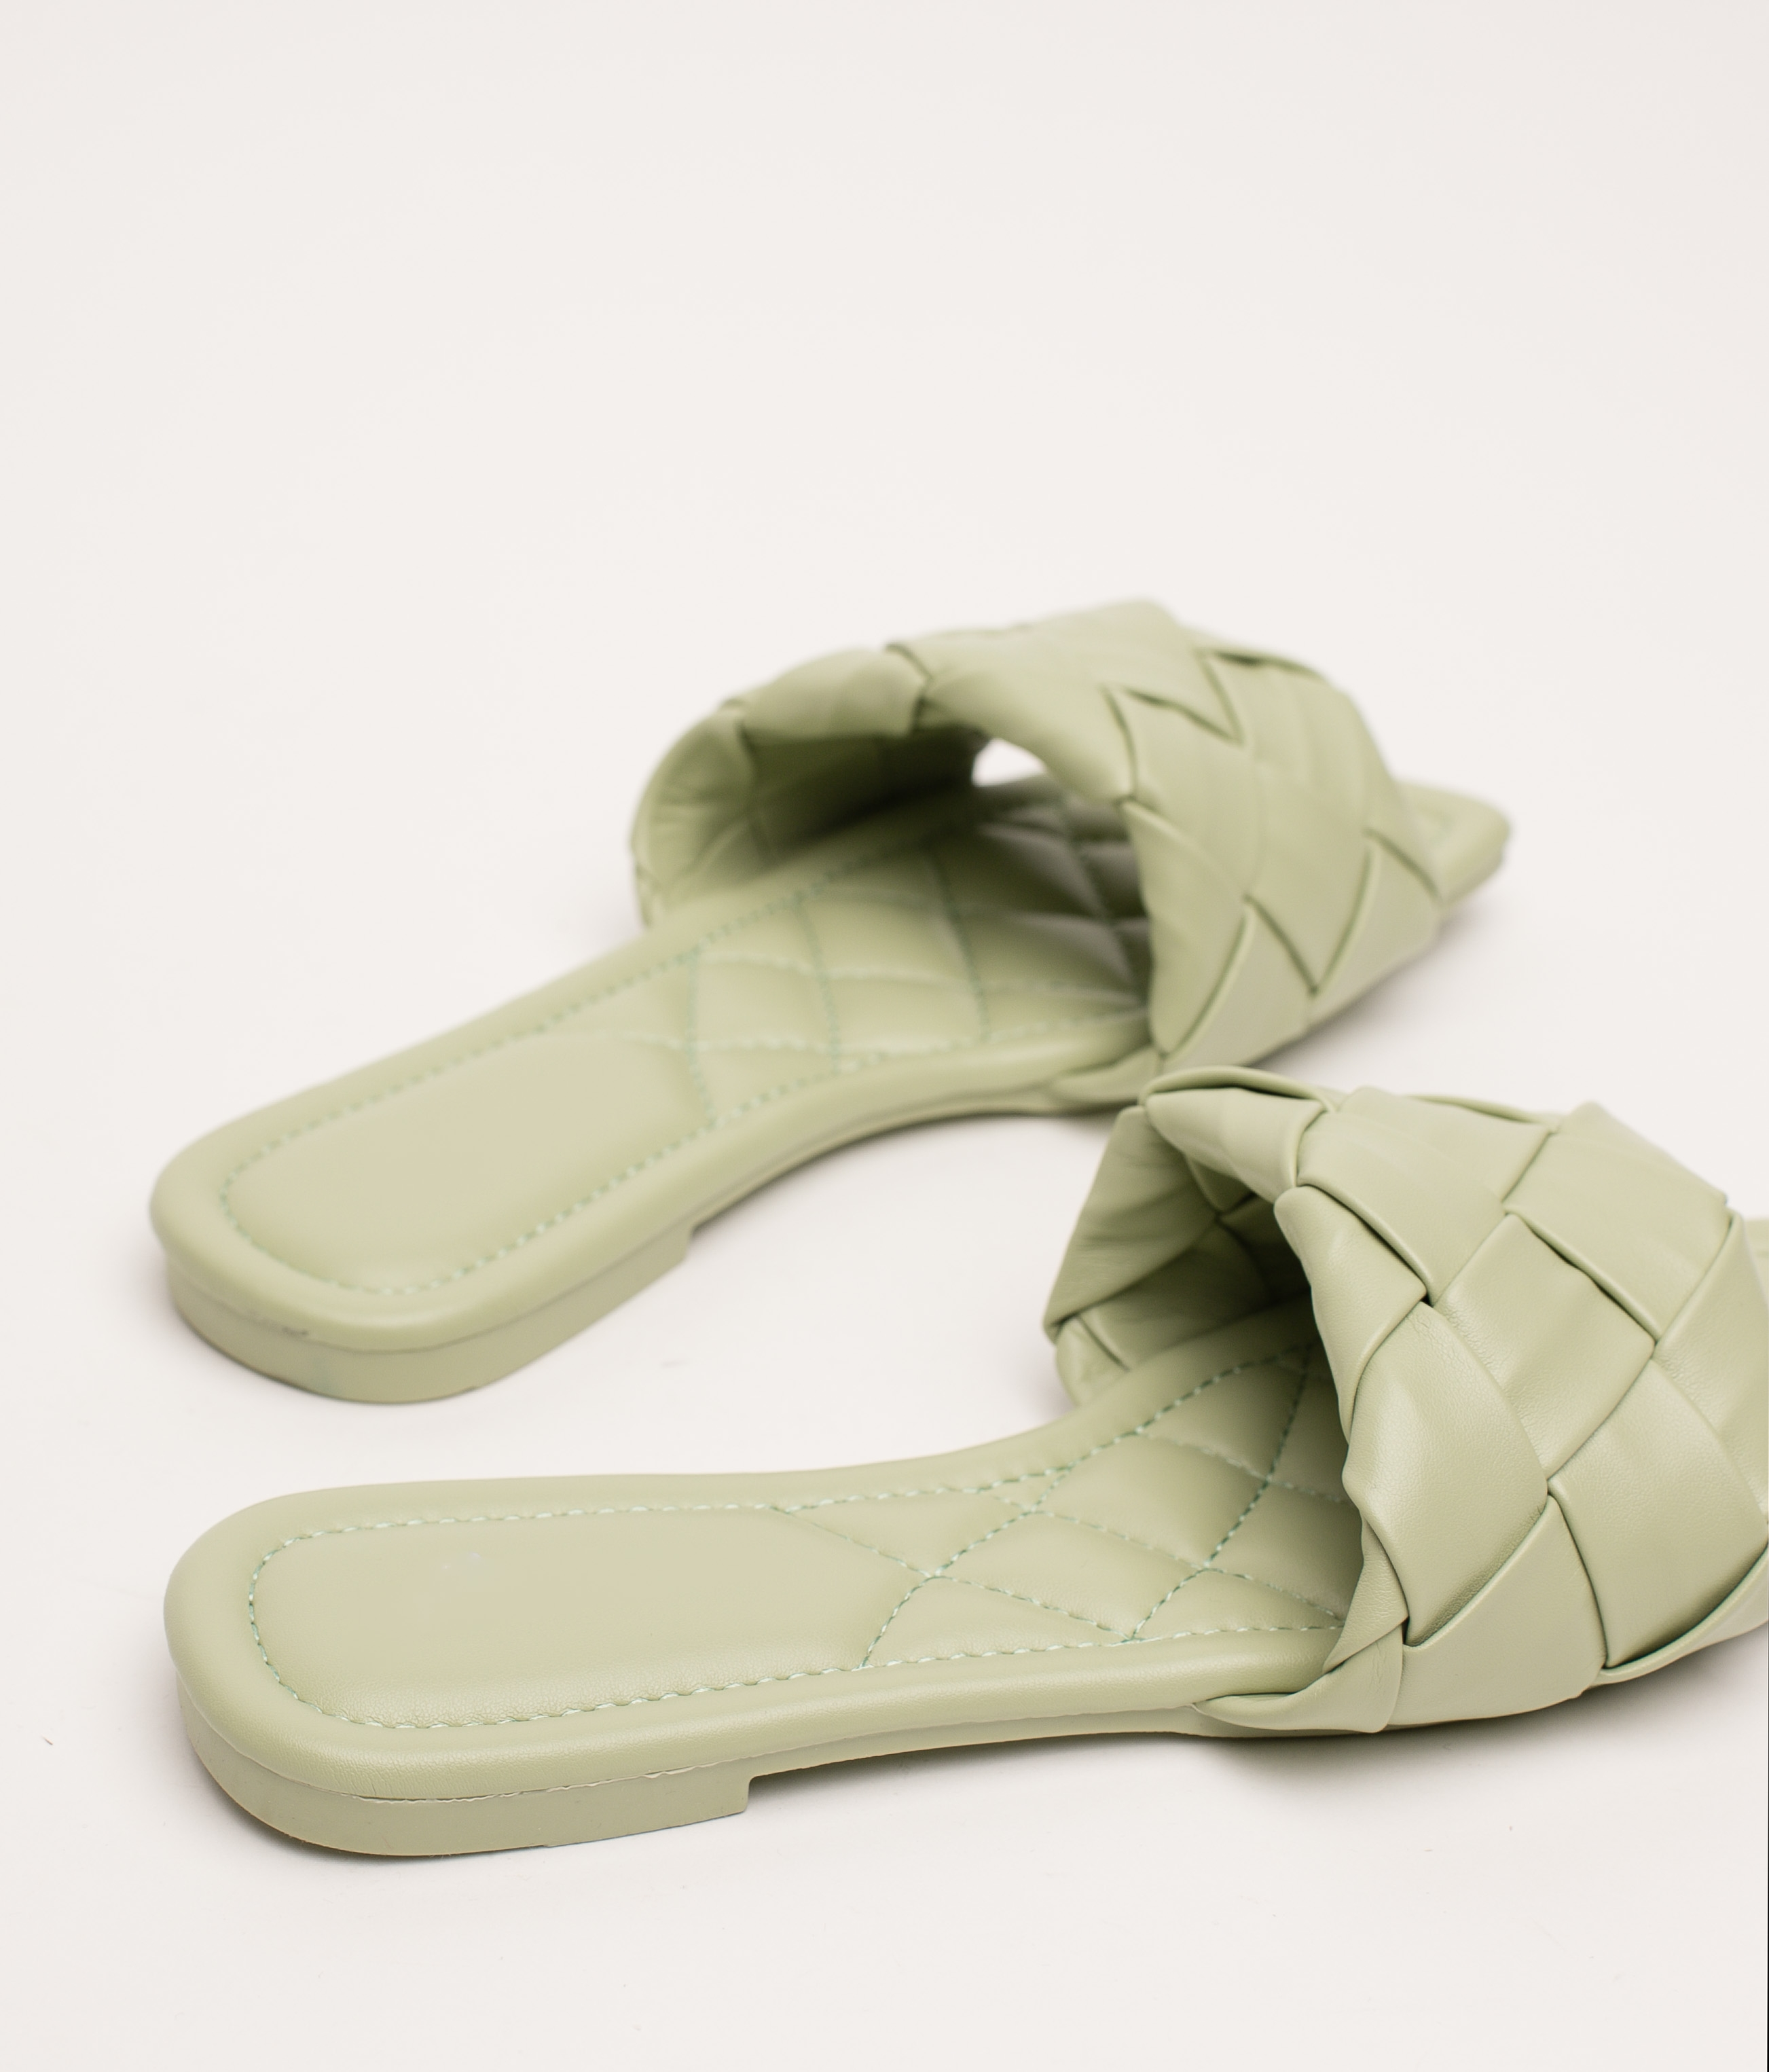 SORATA SANDAL - GREEN